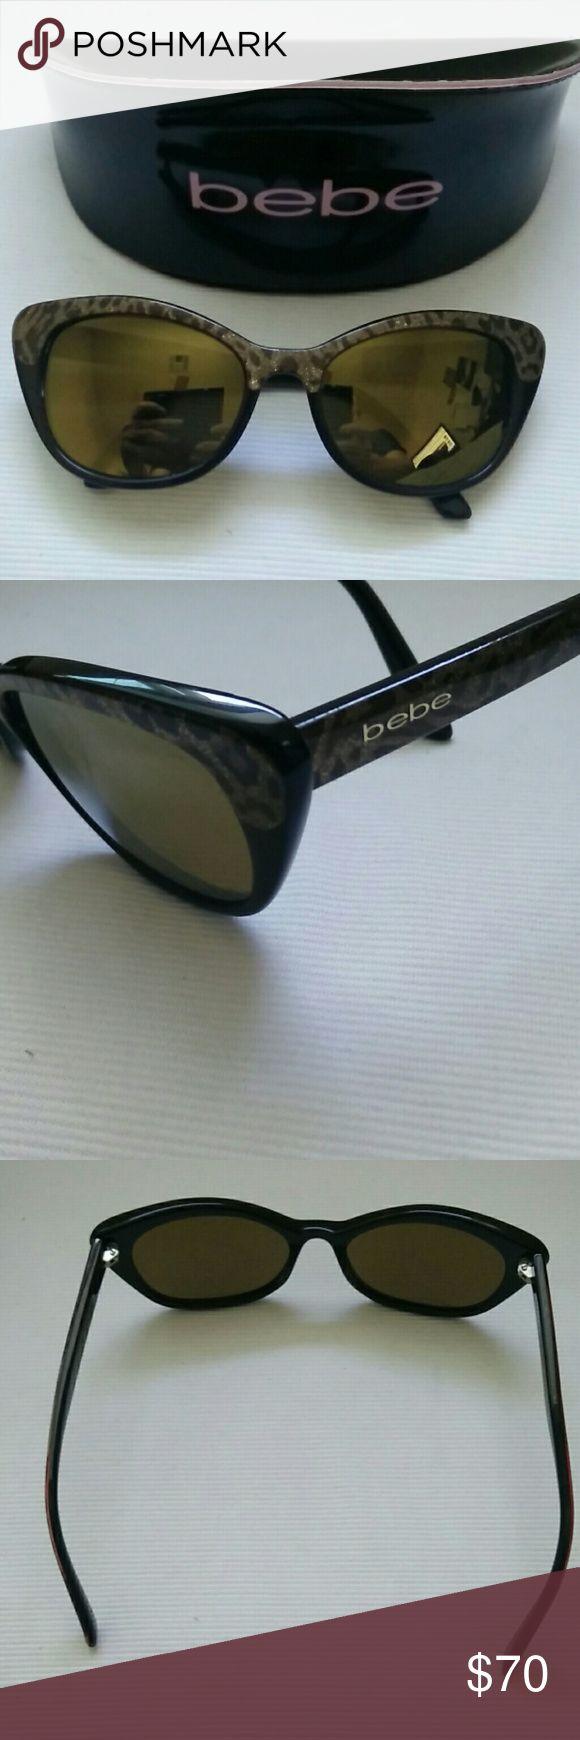 Bebe Women's Sunglass Bebe Women's Sunglass, Gold Mirror lens, gold flake tortoise color. bebe Accessories Sunglasses